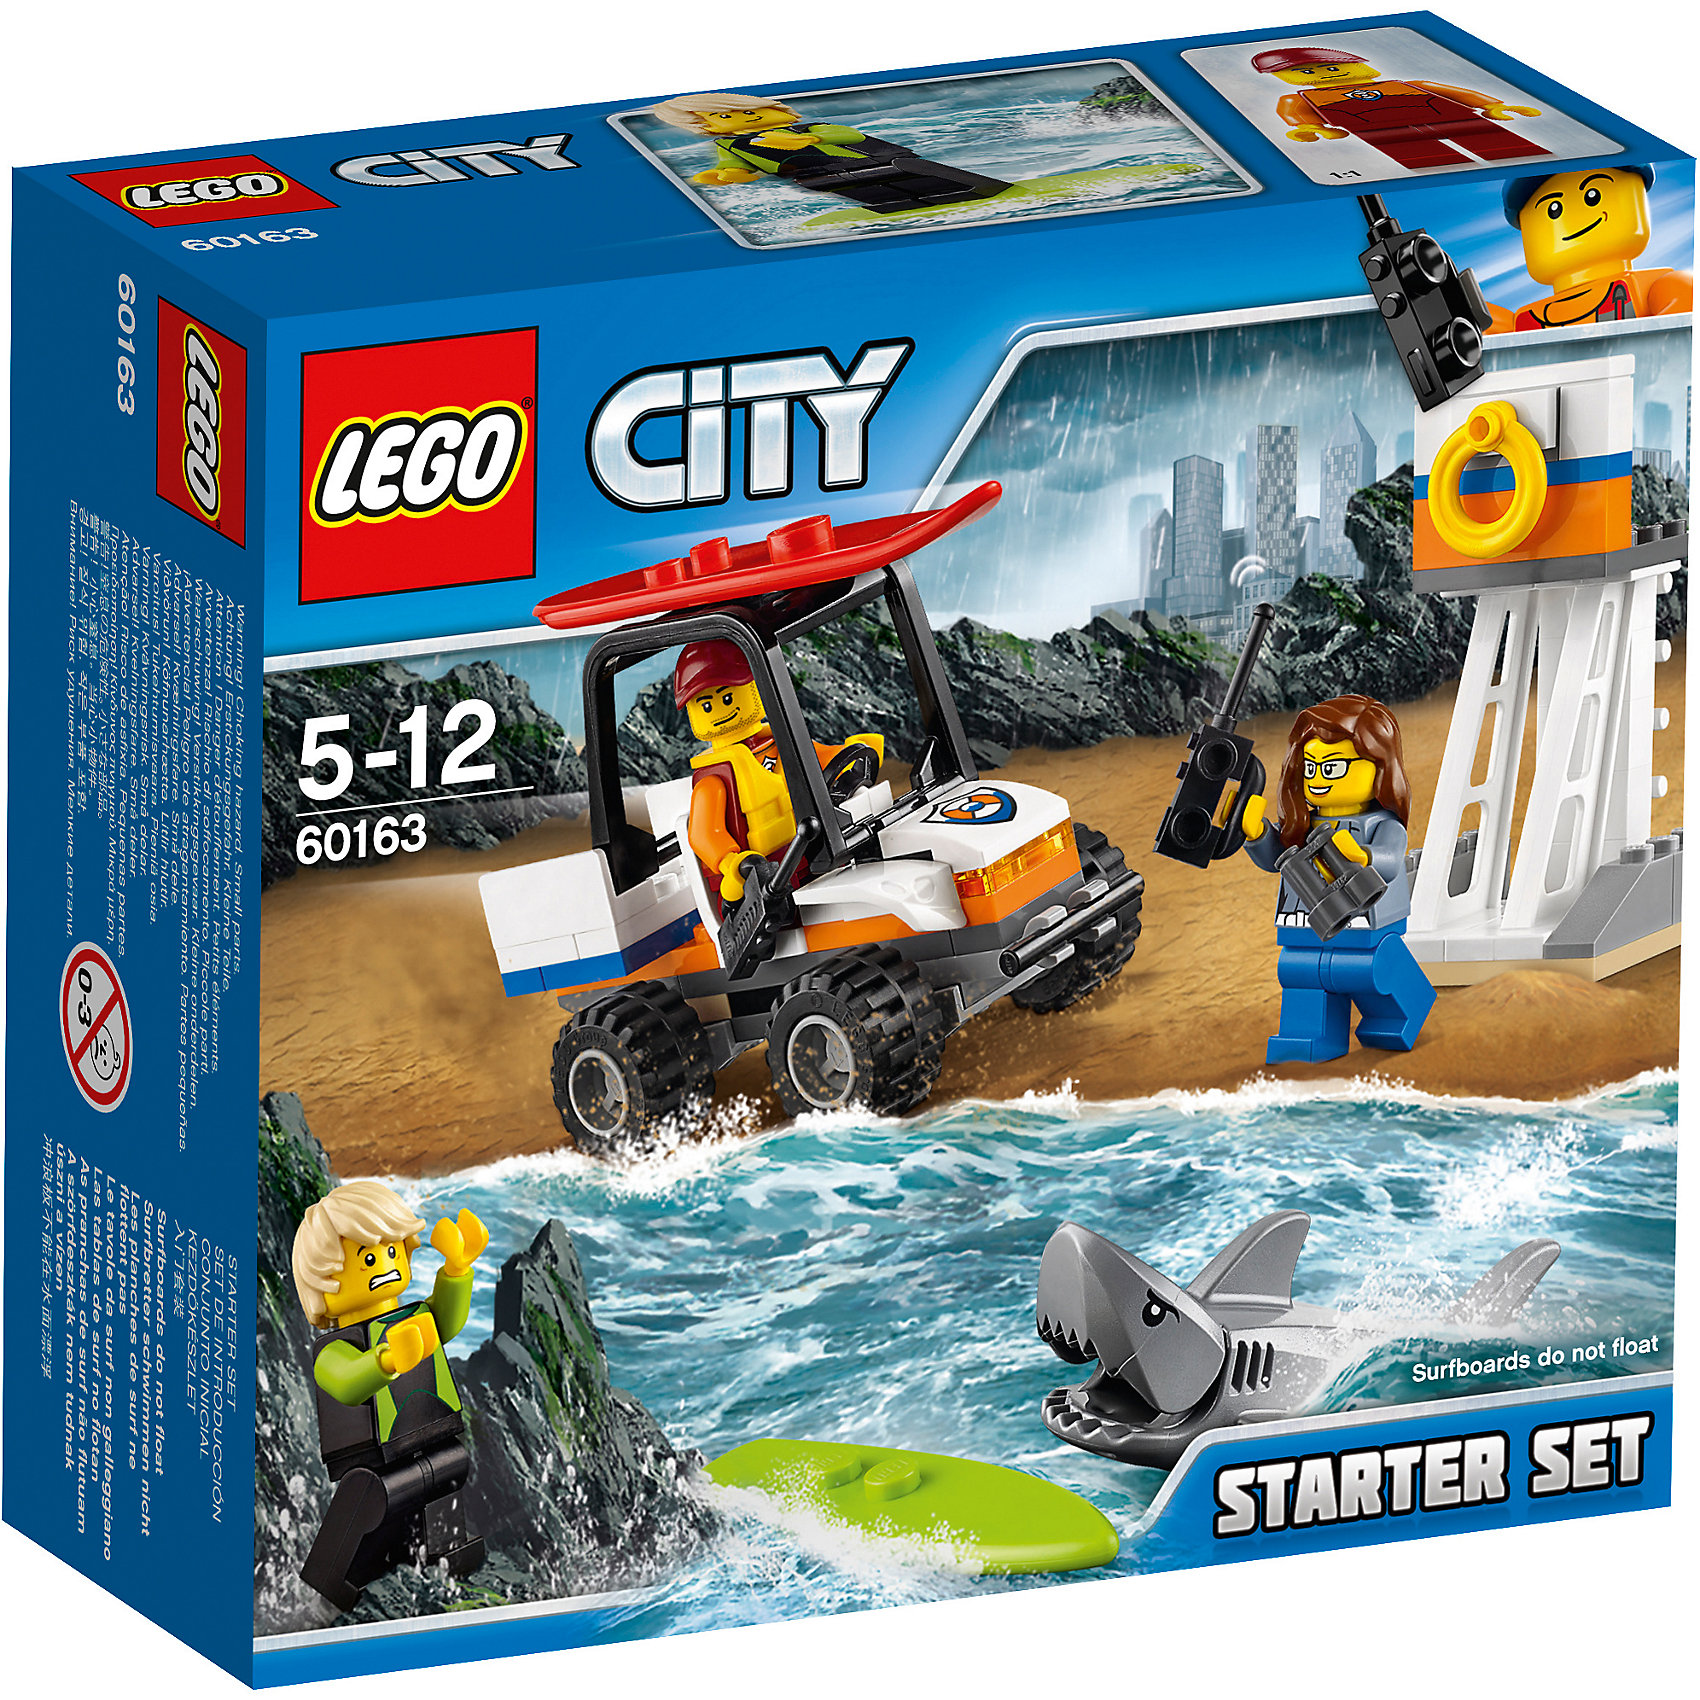 LEGO City 60163: Набор для начинающих «Береговая охрана»Пластмассовые конструкторы<br><br><br>Ширина мм: 160<br>Глубина мм: 144<br>Высота мм: 63<br>Вес г: 142<br>Возраст от месяцев: 60<br>Возраст до месяцев: 144<br>Пол: Мужской<br>Возраст: Детский<br>SKU: 5620023